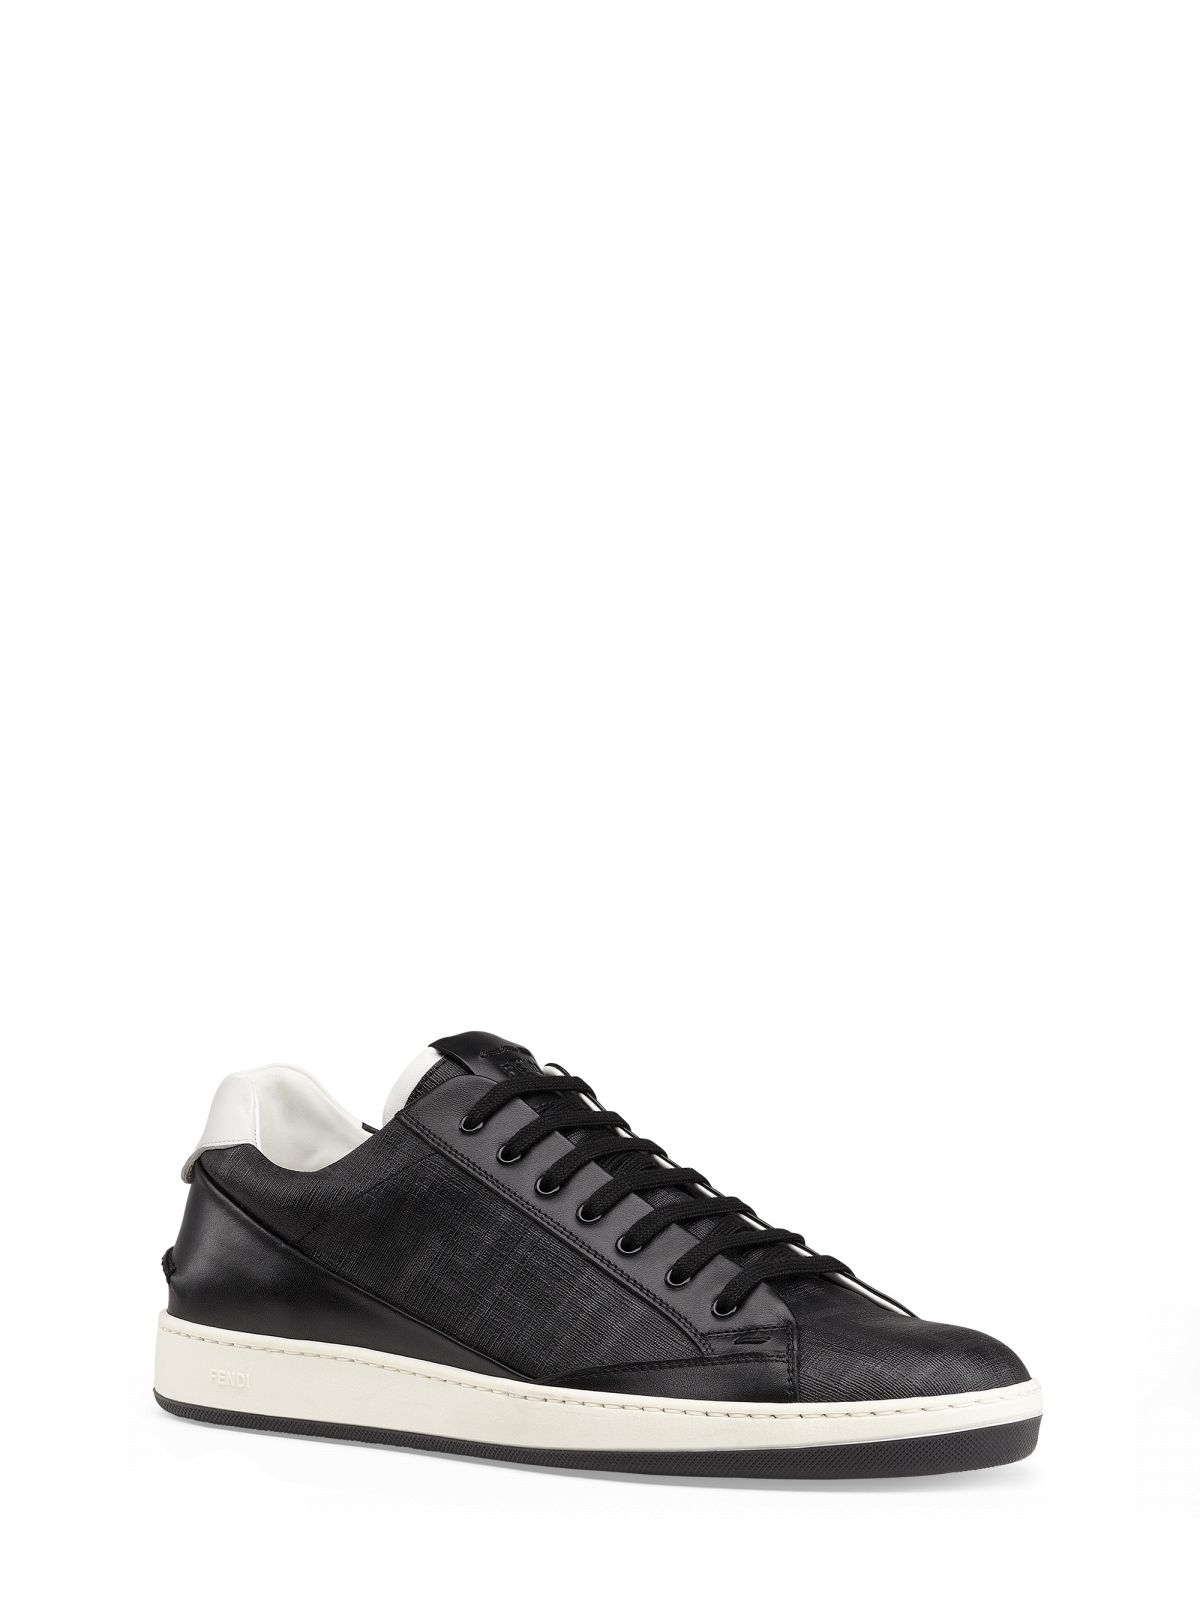 fef177b0e886c Fendi - 7E0781 U1B KHD Mens Designer Shoes, Luxury Branding, Lanvin, Casual  Shoes